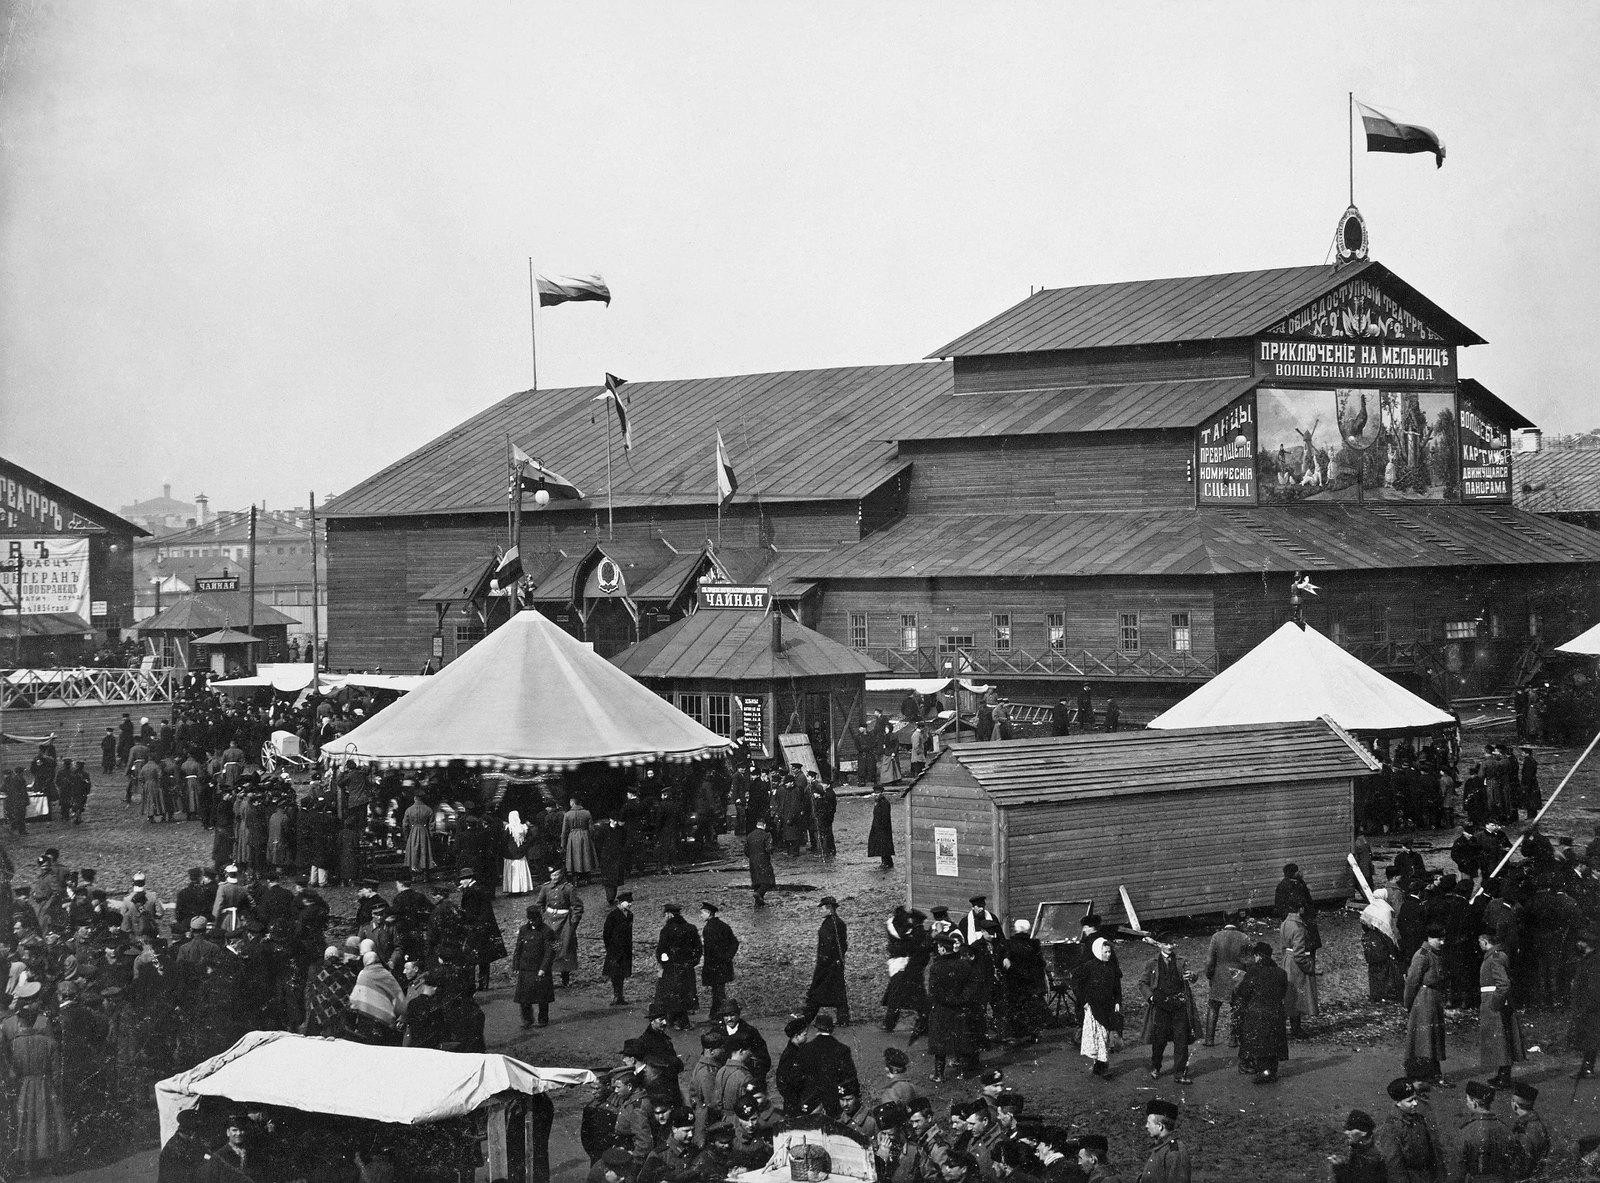 1890-е. Народное гуляние на Обводном канале.